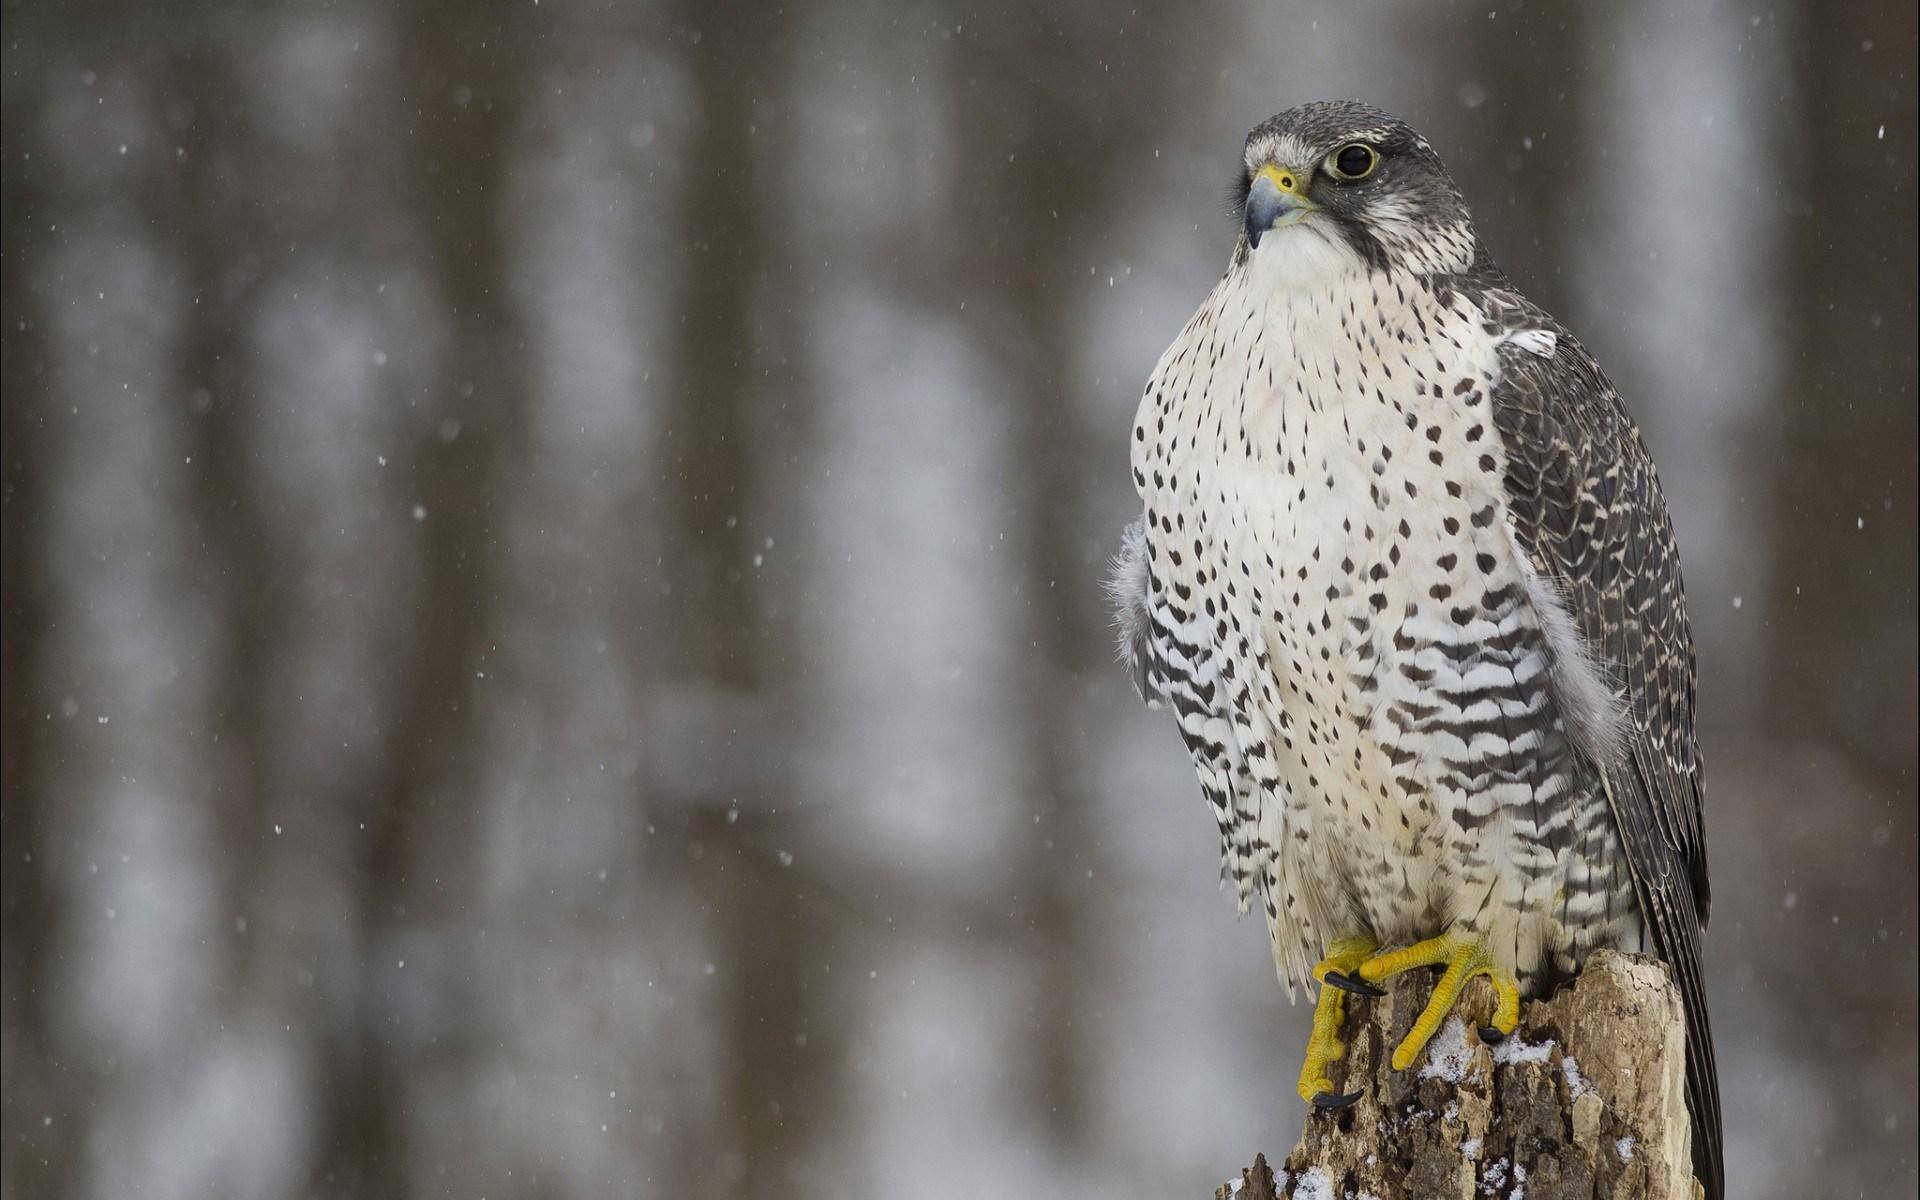 Falcons Wallpaper: 22 Excellent HD Falcon Bird Wallpapers